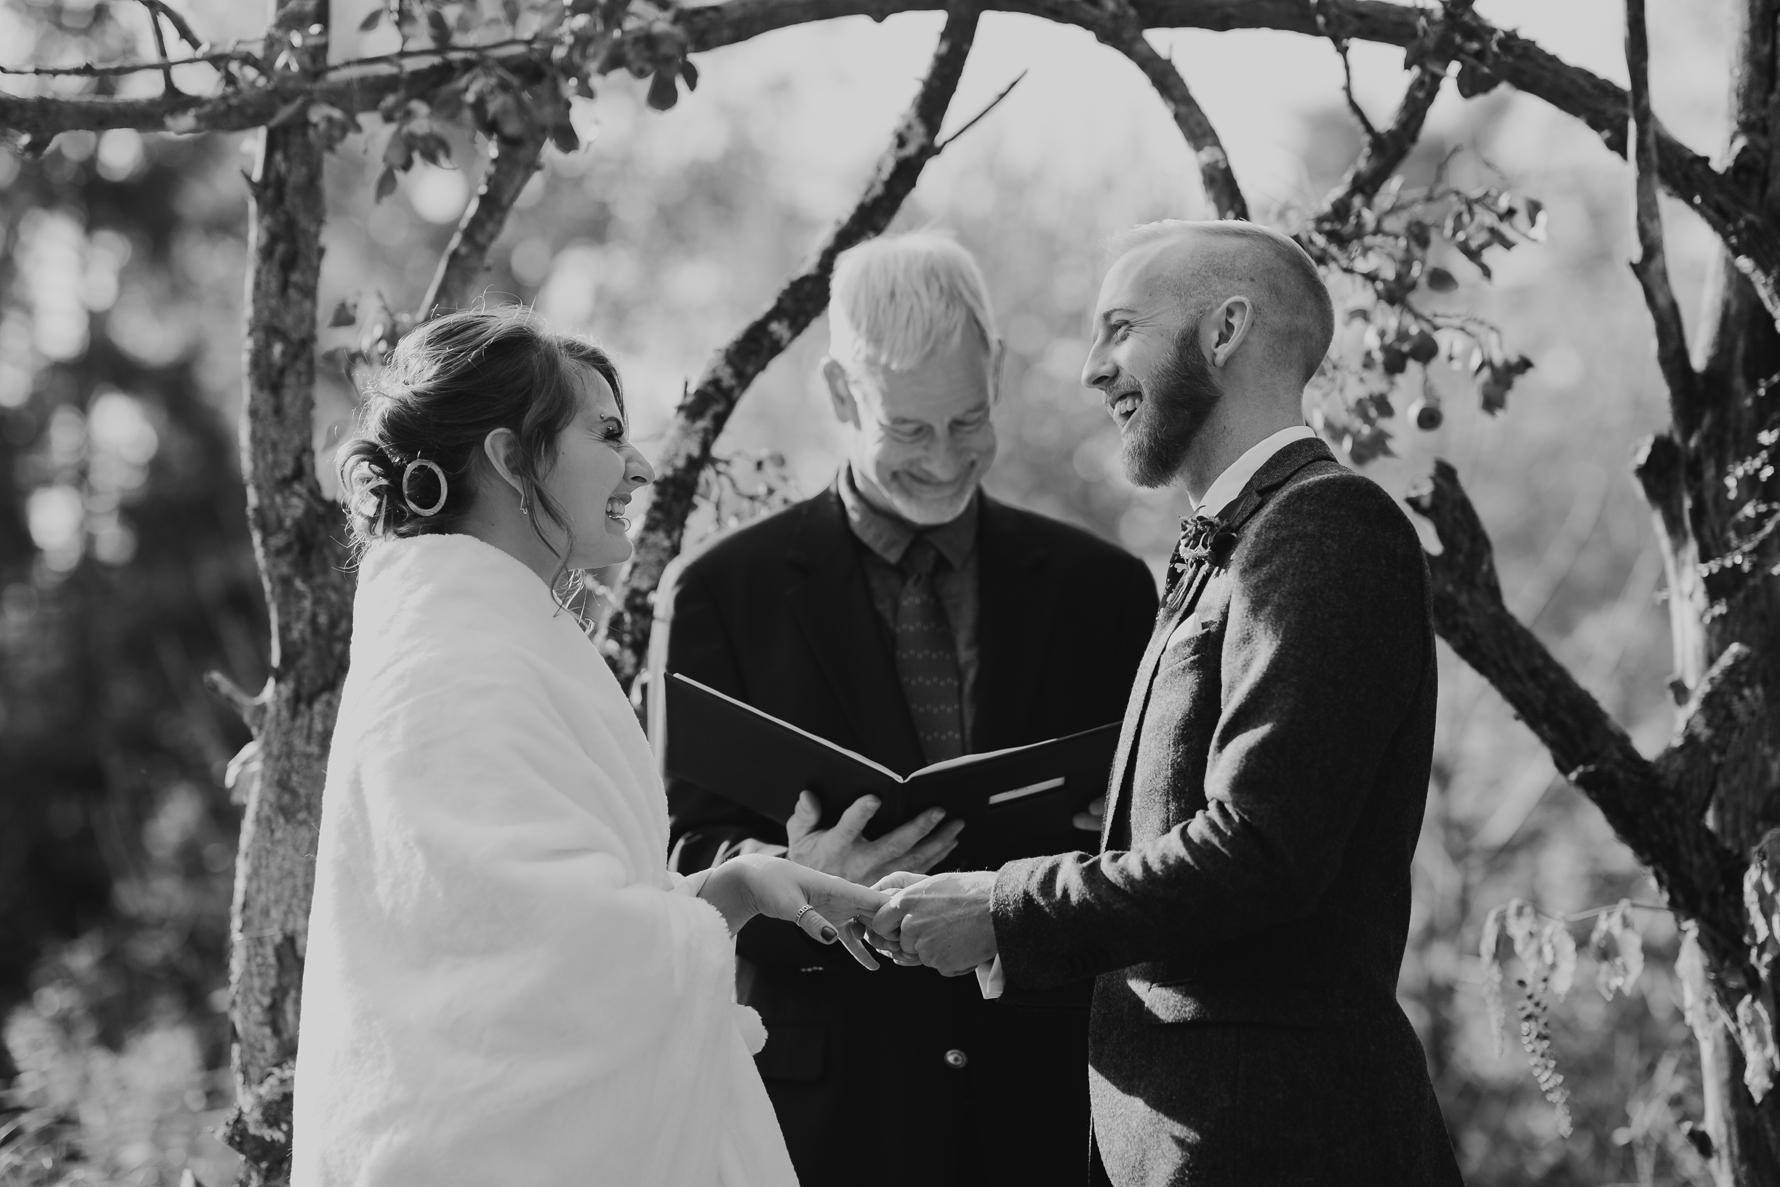 norris-traverse-city-wedding-46.JPG